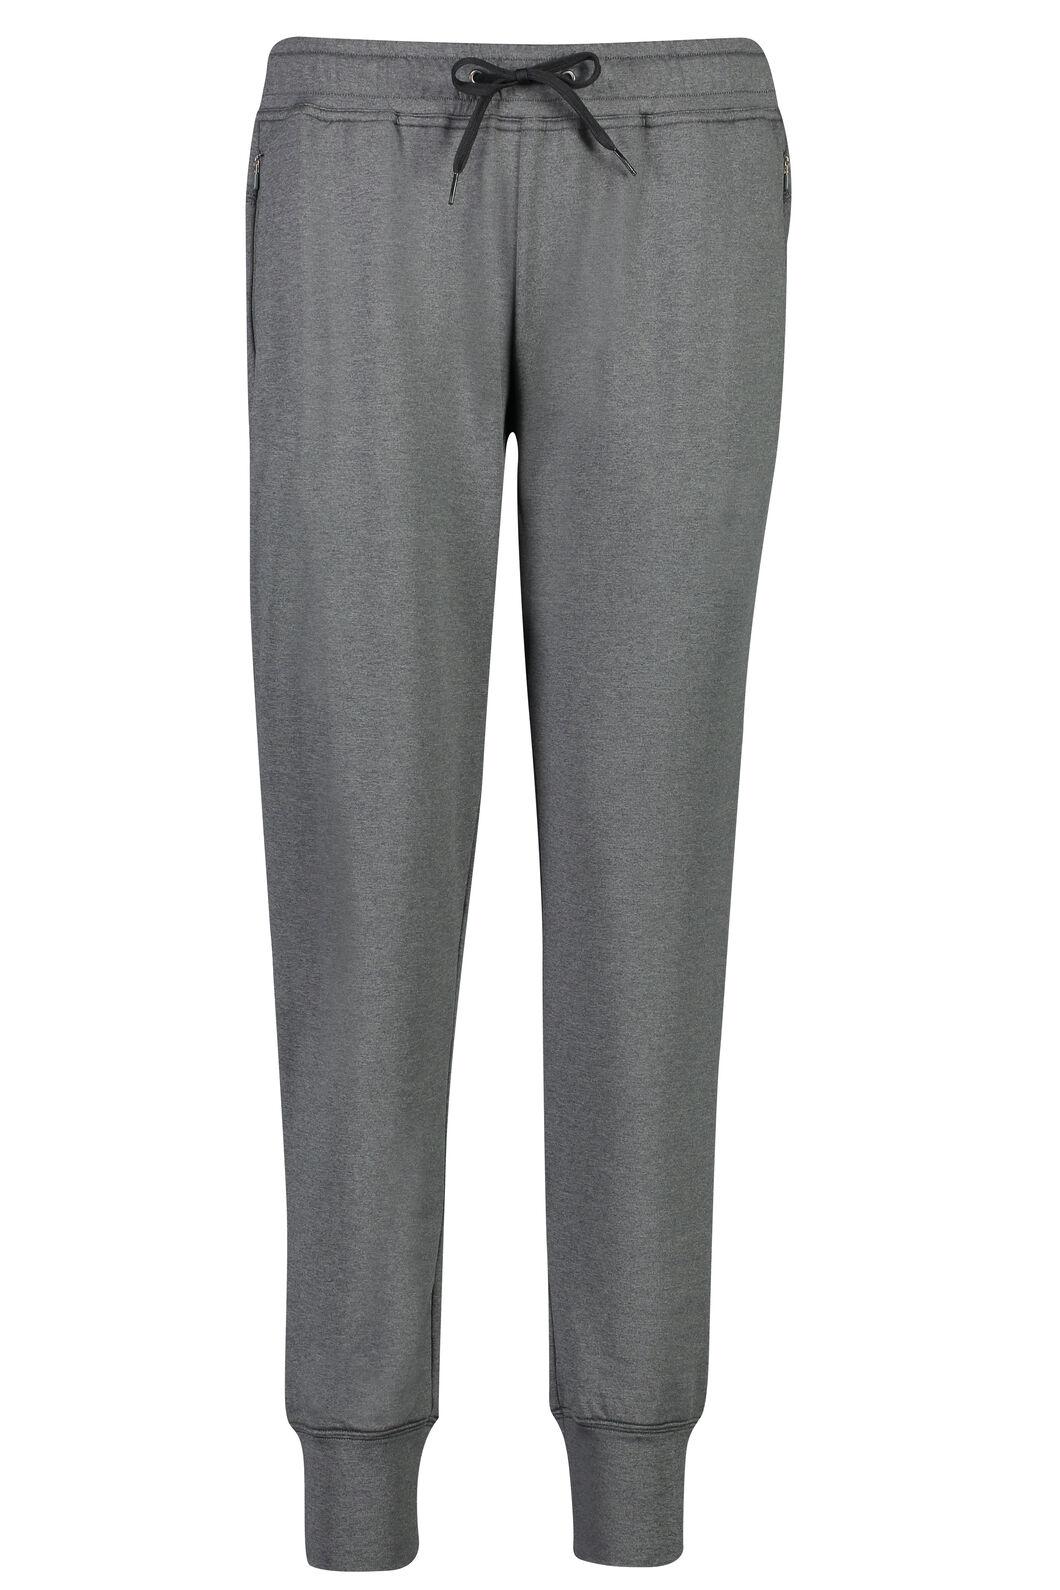 Sweet As Pants - Women's, Charcoal Marle, hi-res